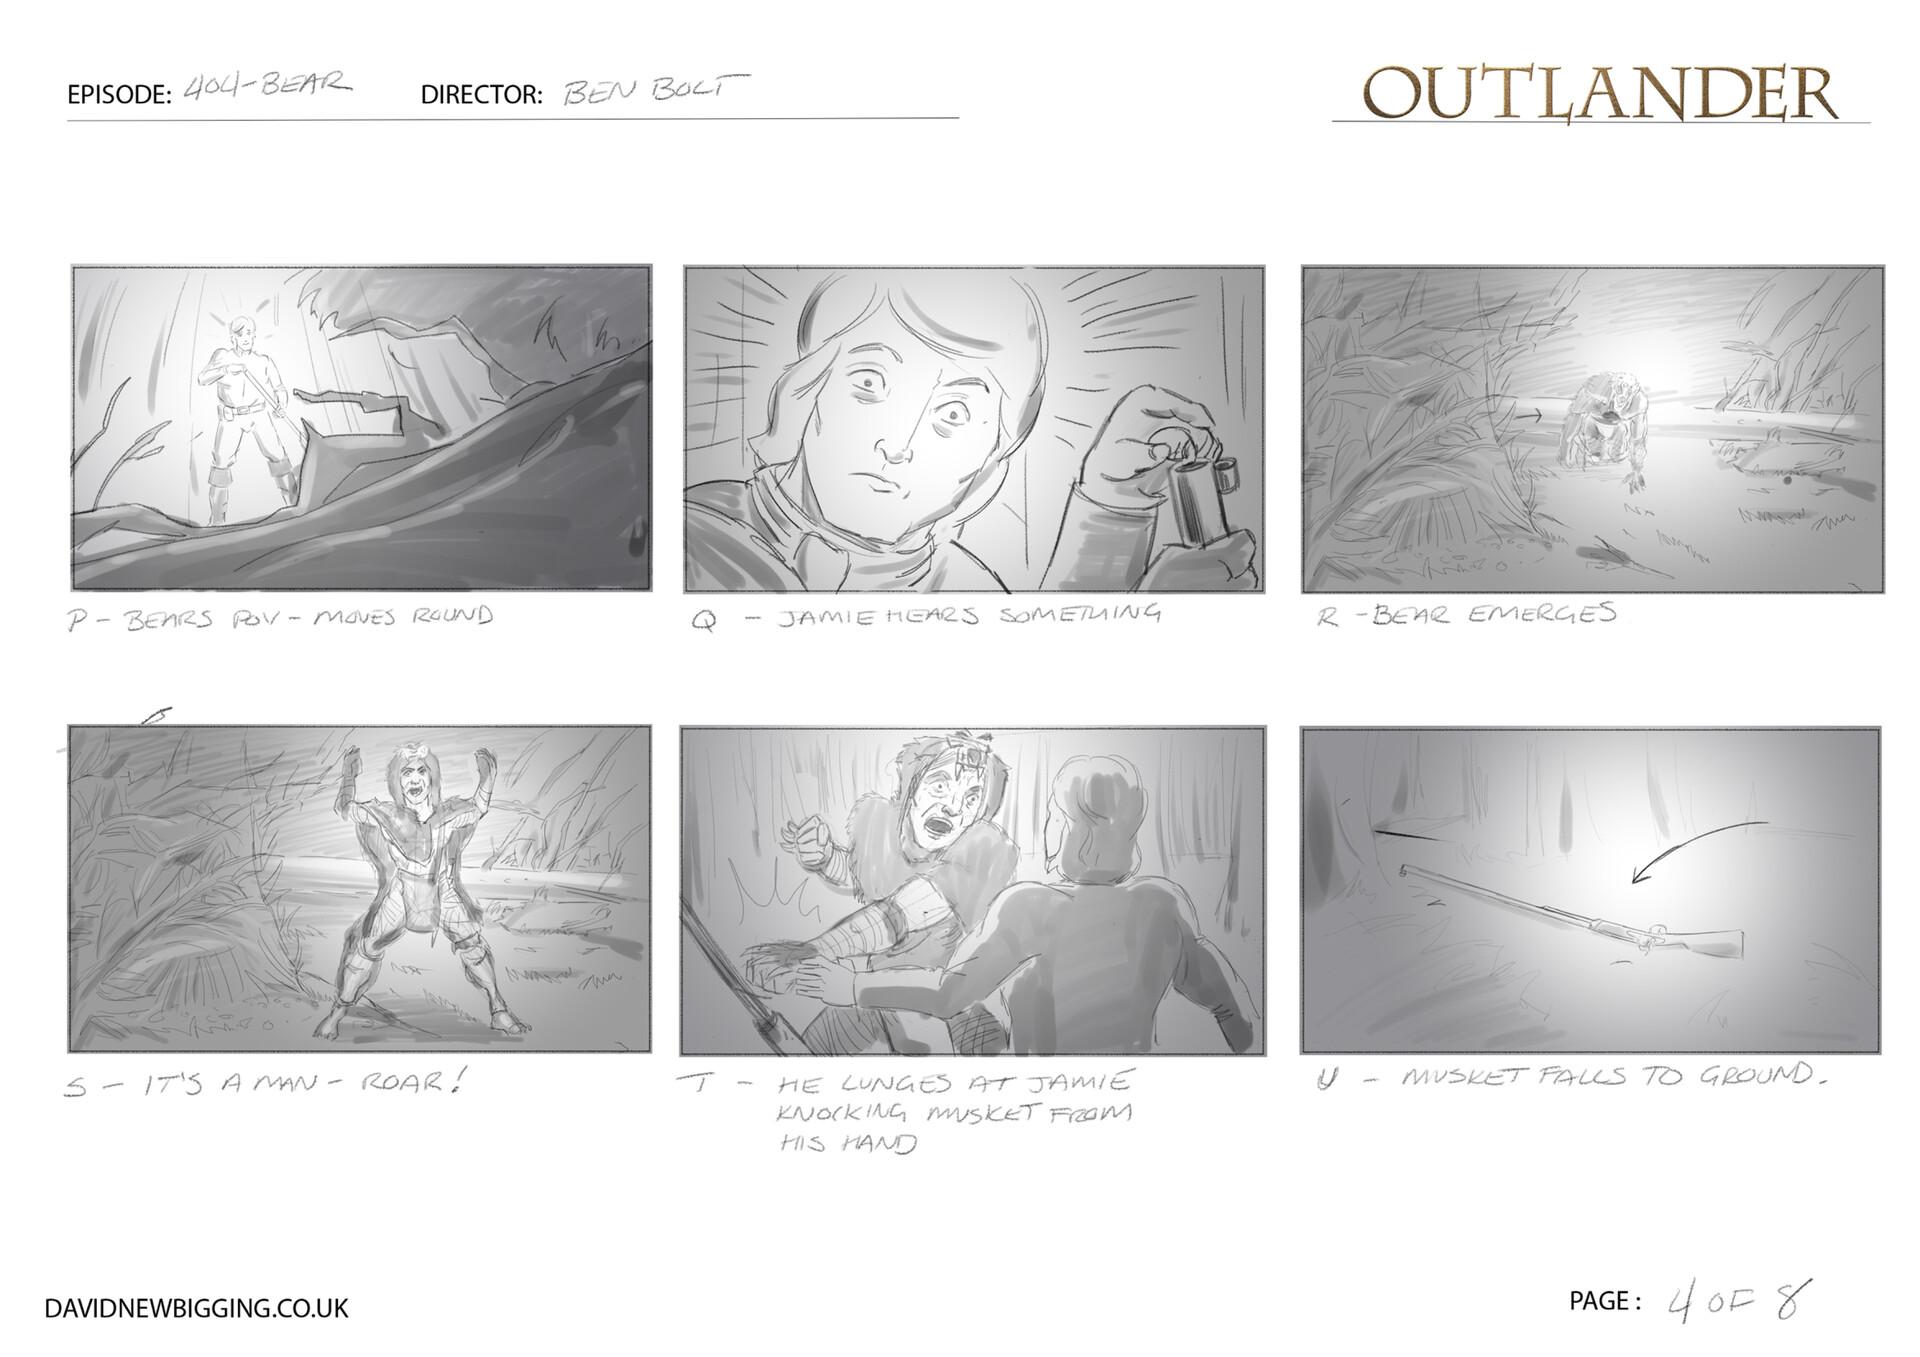 David newbigging outlander 404 bear sequence storyboards 4